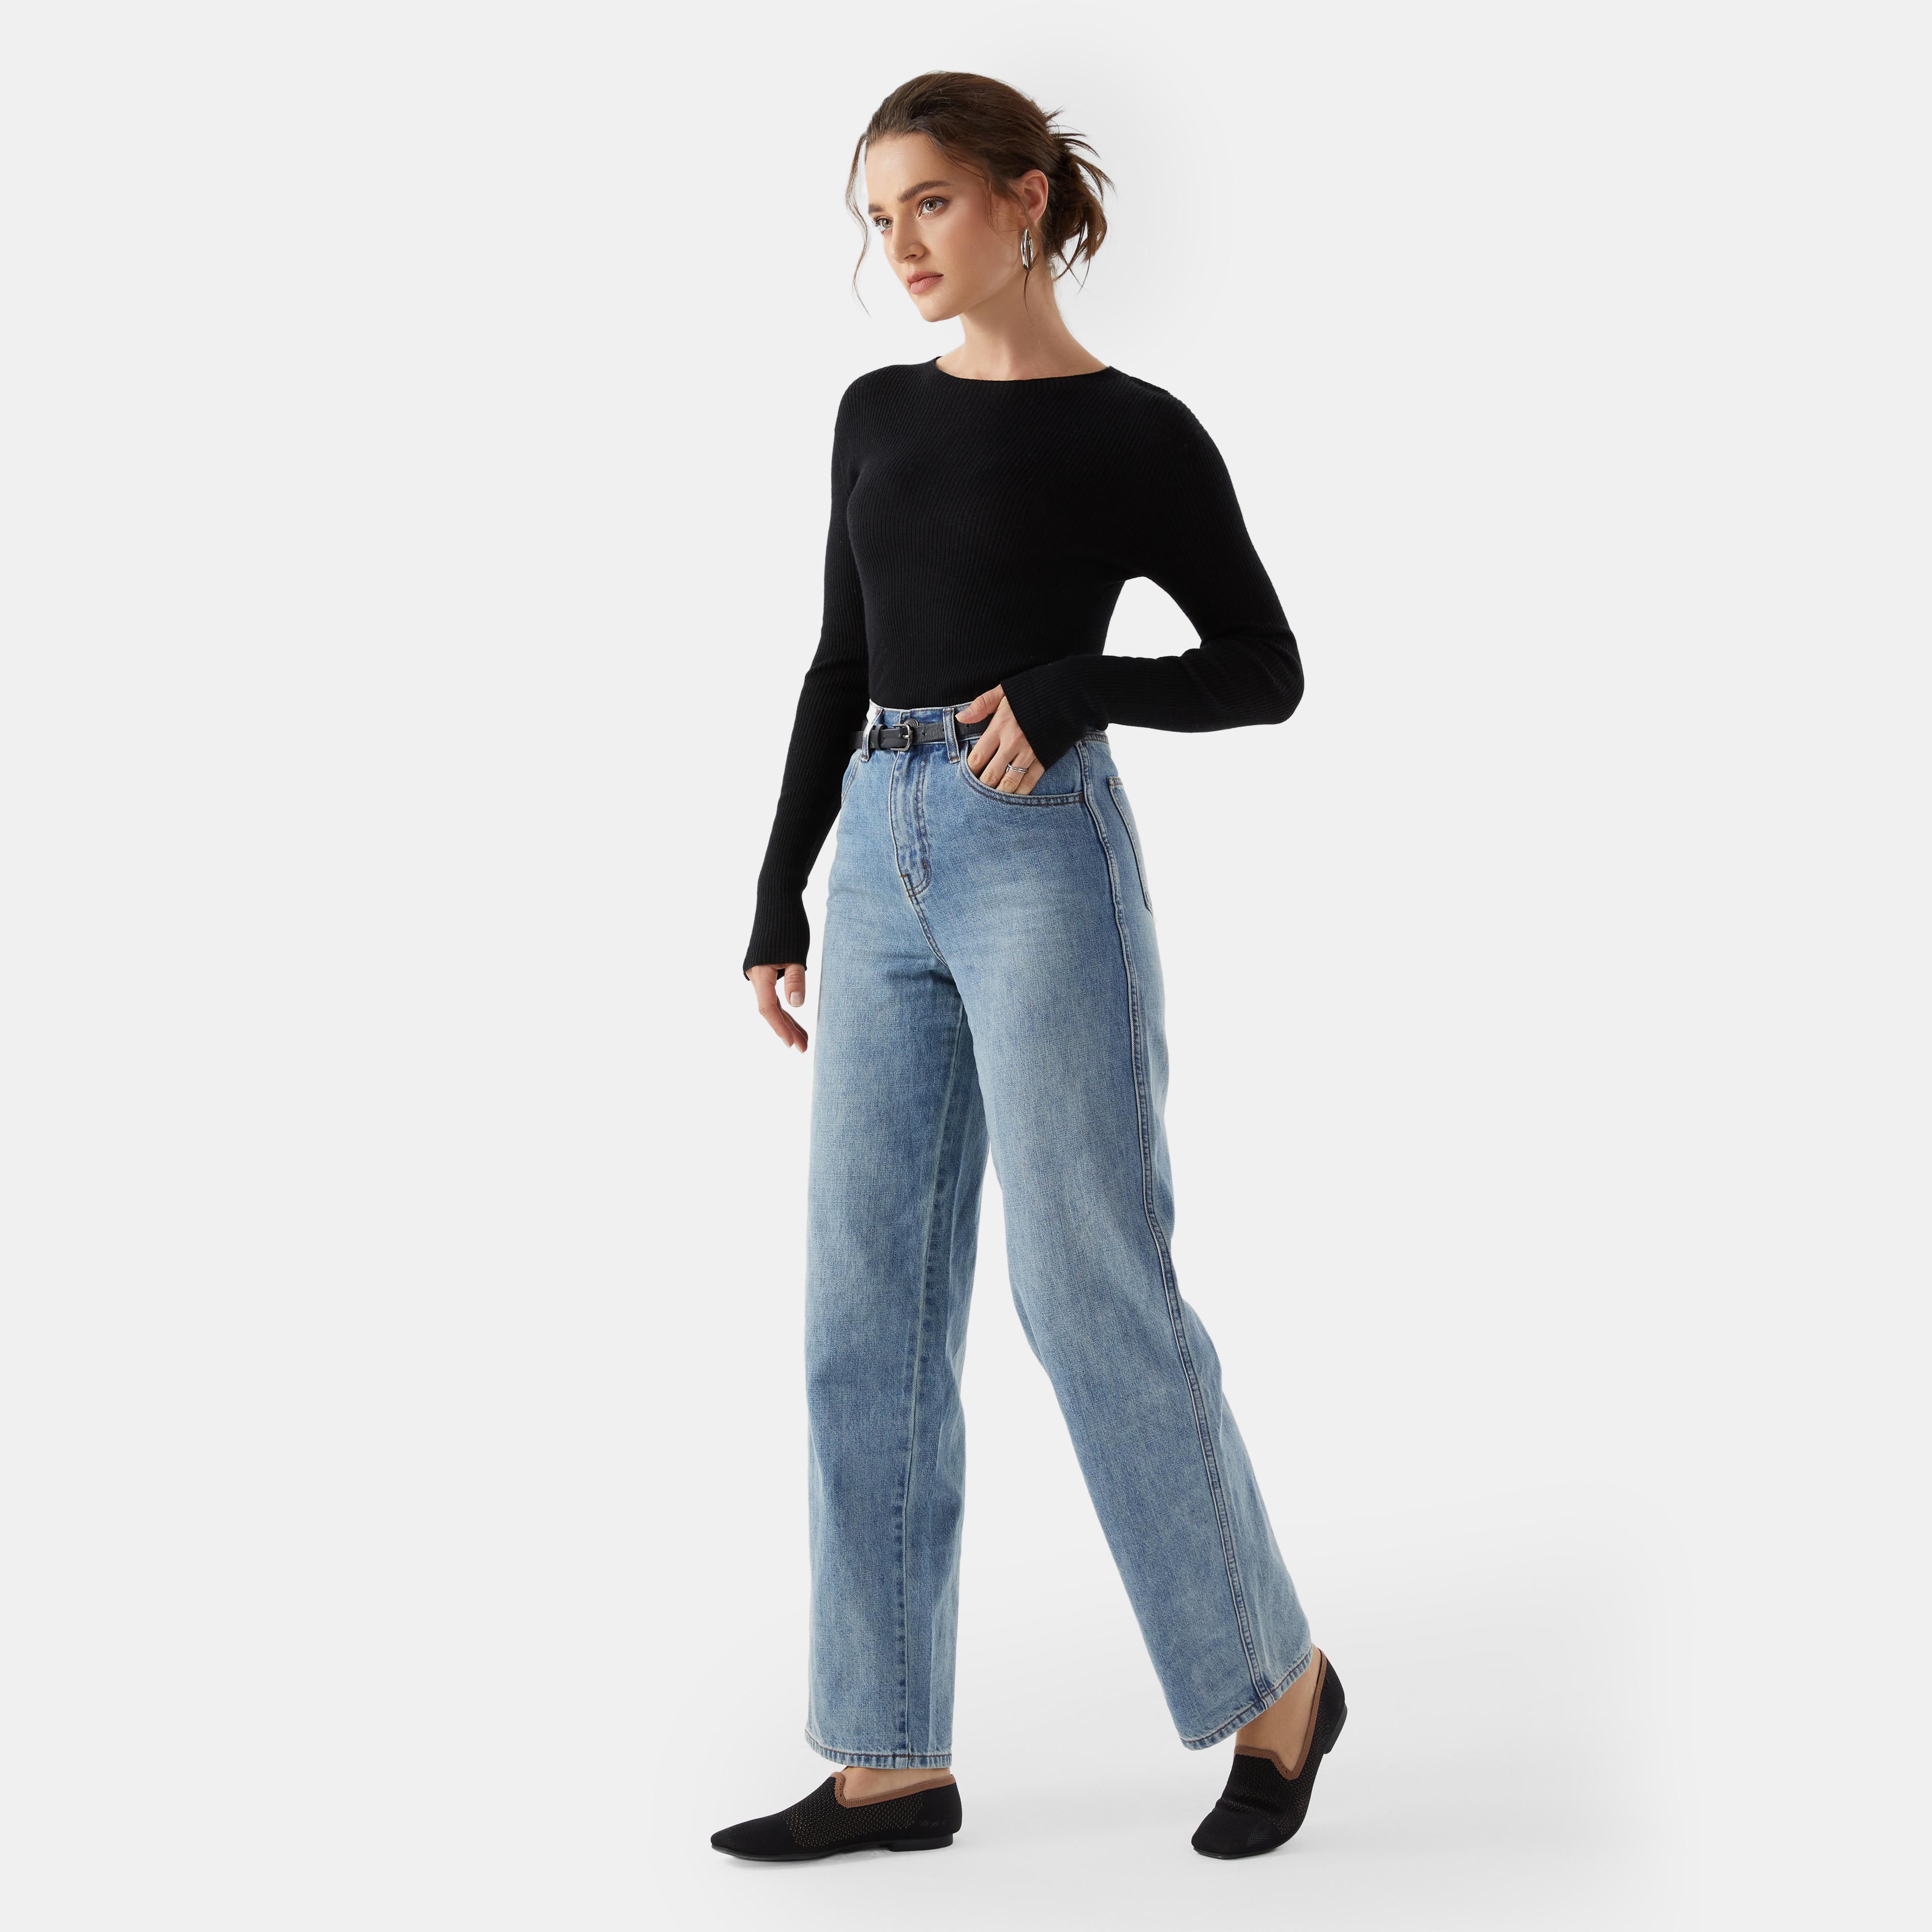 Cashmere Top-Solid Black - Solid Black S